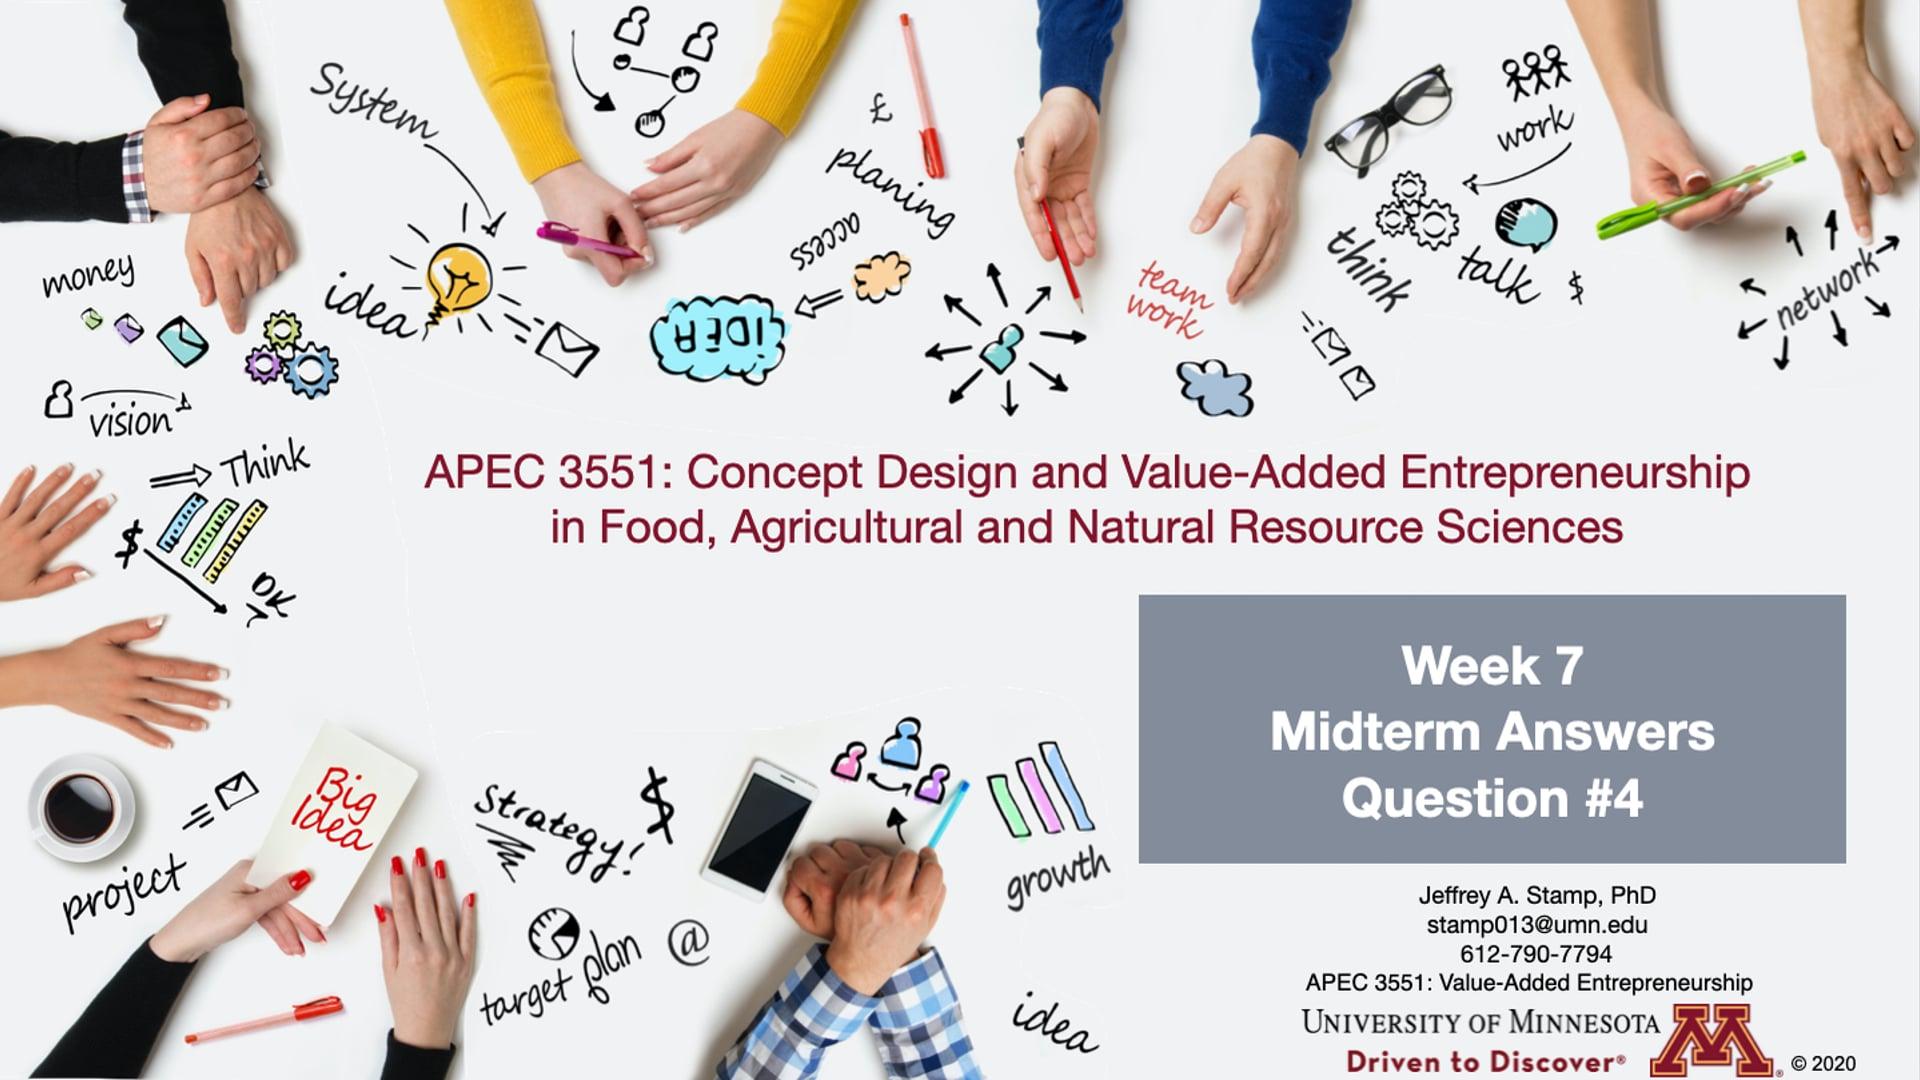 APEC 3551 F20 Midterm Answers Question #4